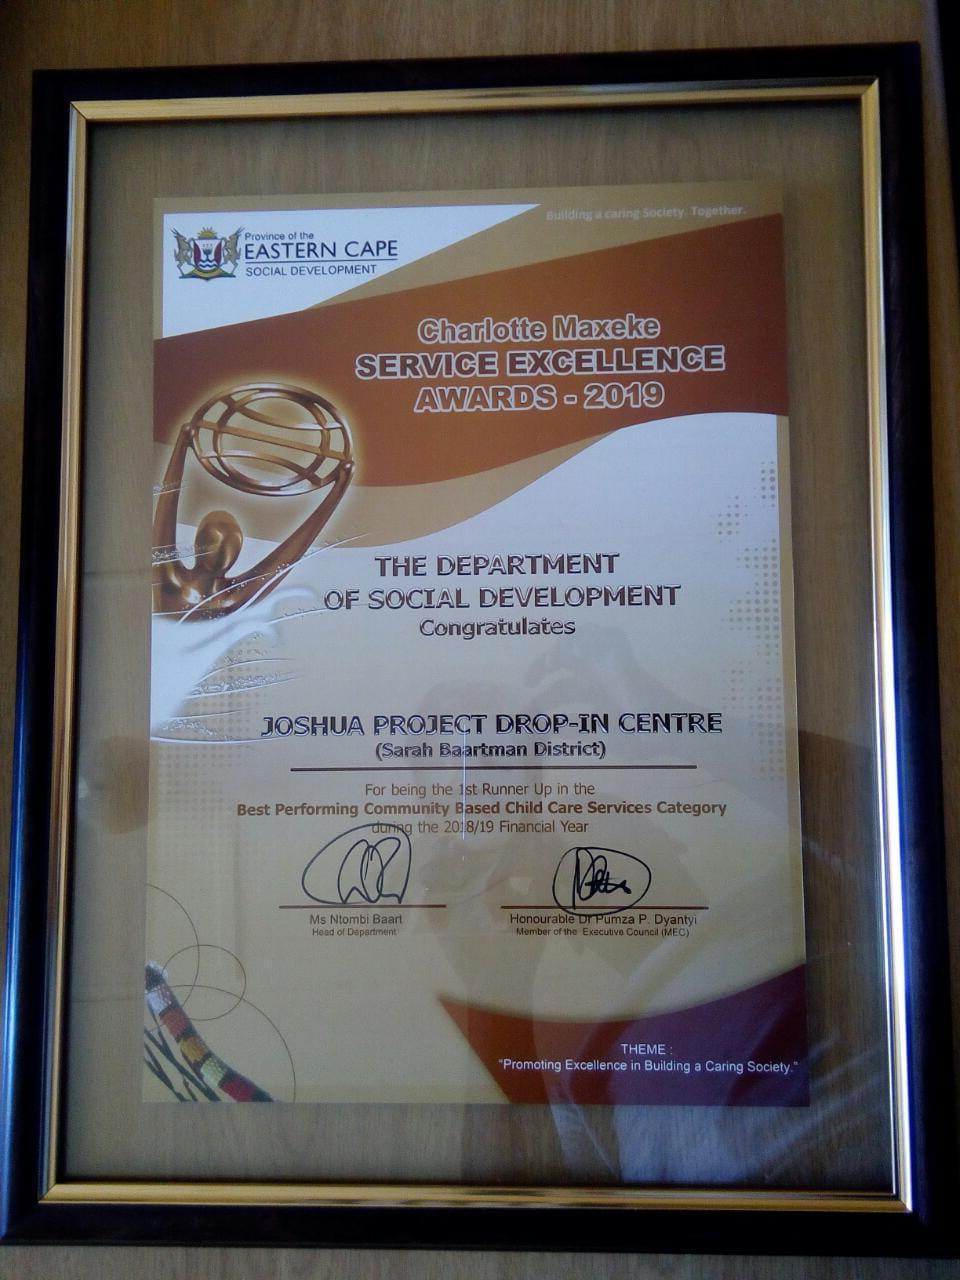 Charlotte Maxeke Award